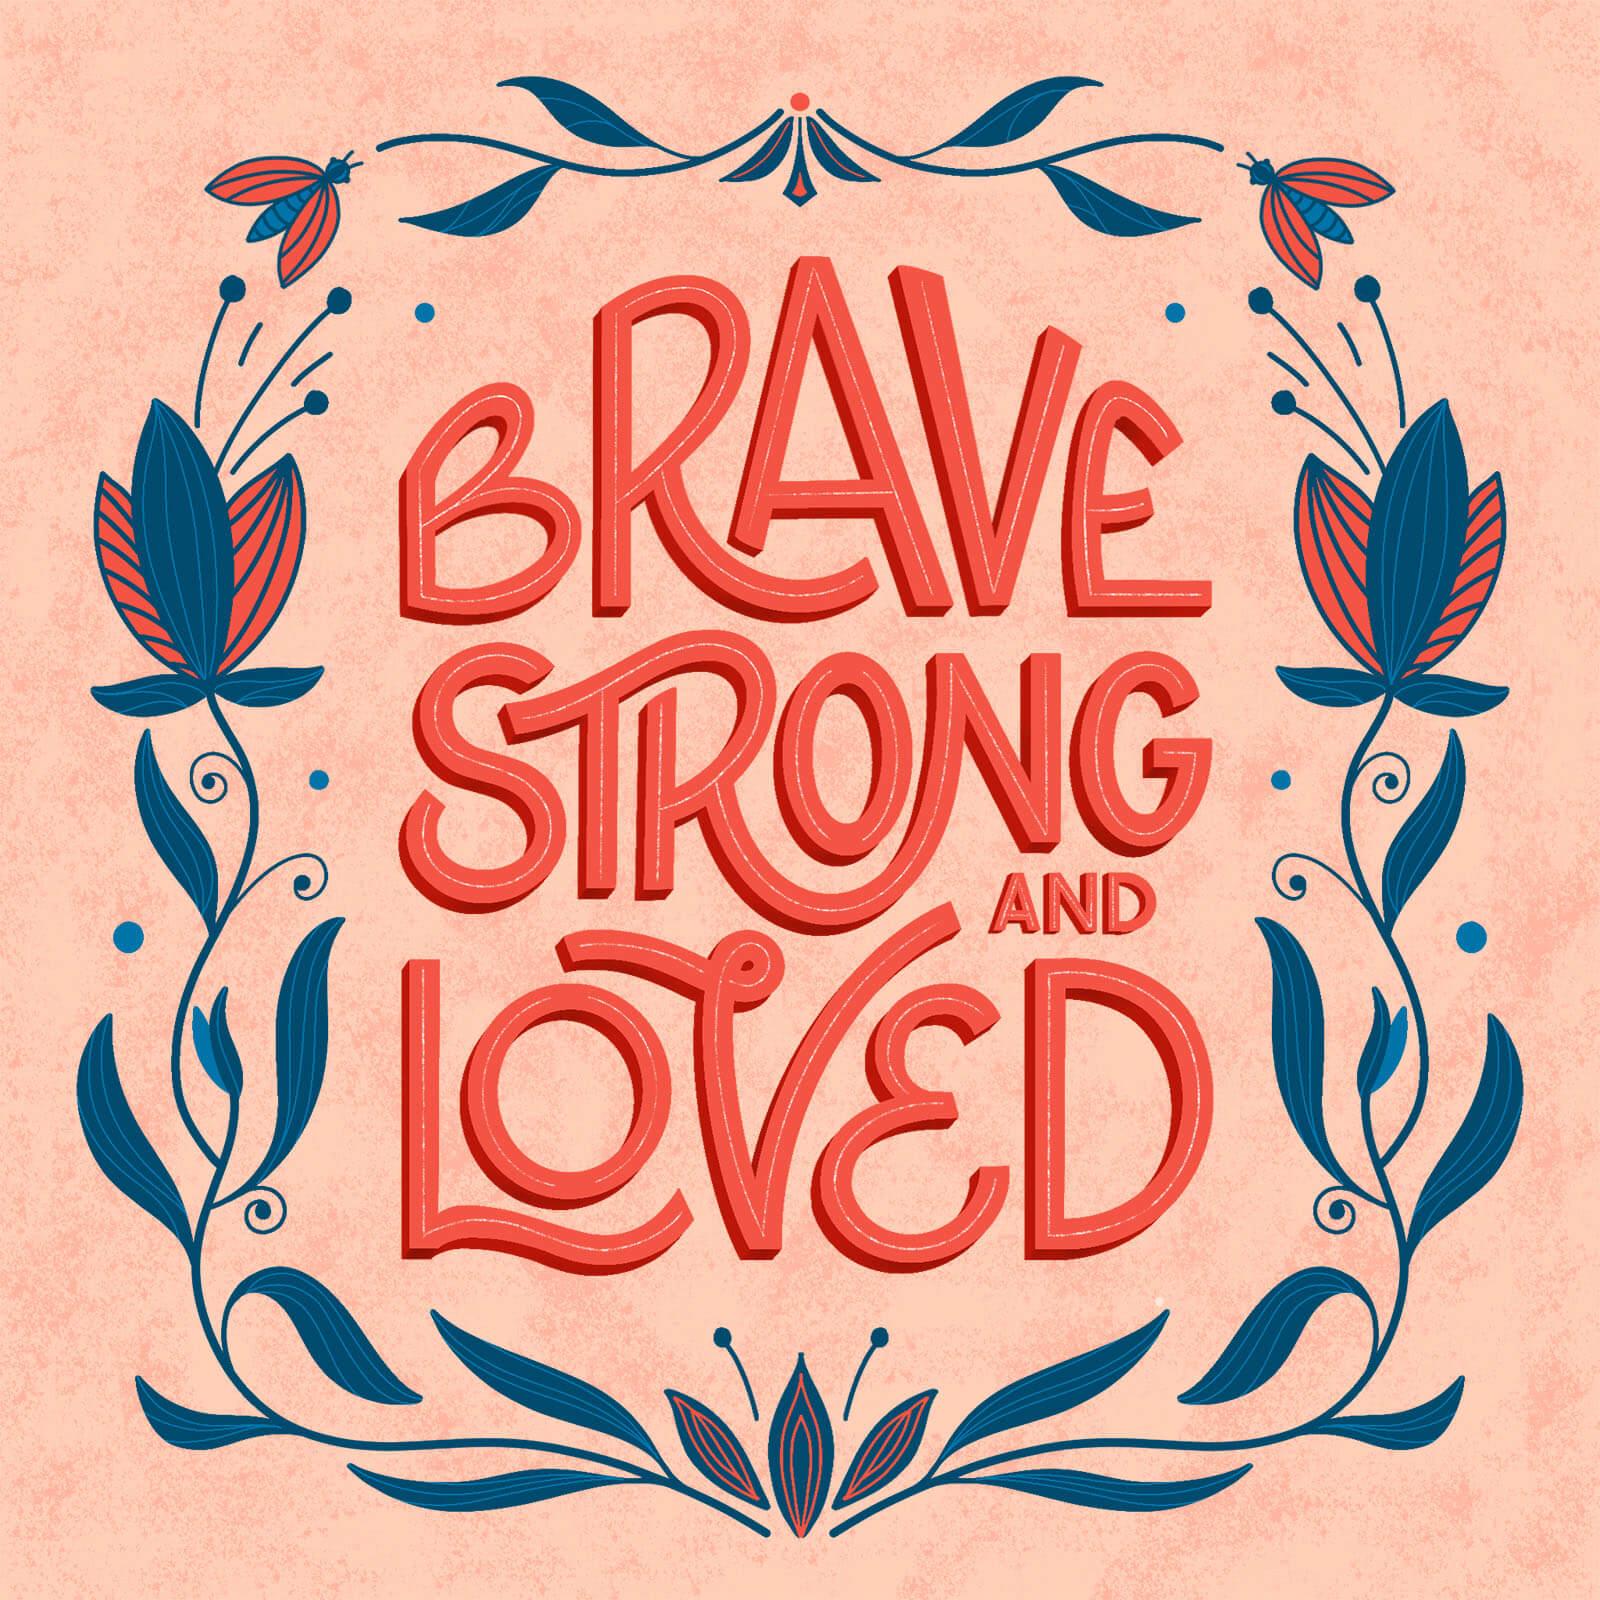 Brave, Strong and Loved - Ekaterina Vasilevskaya